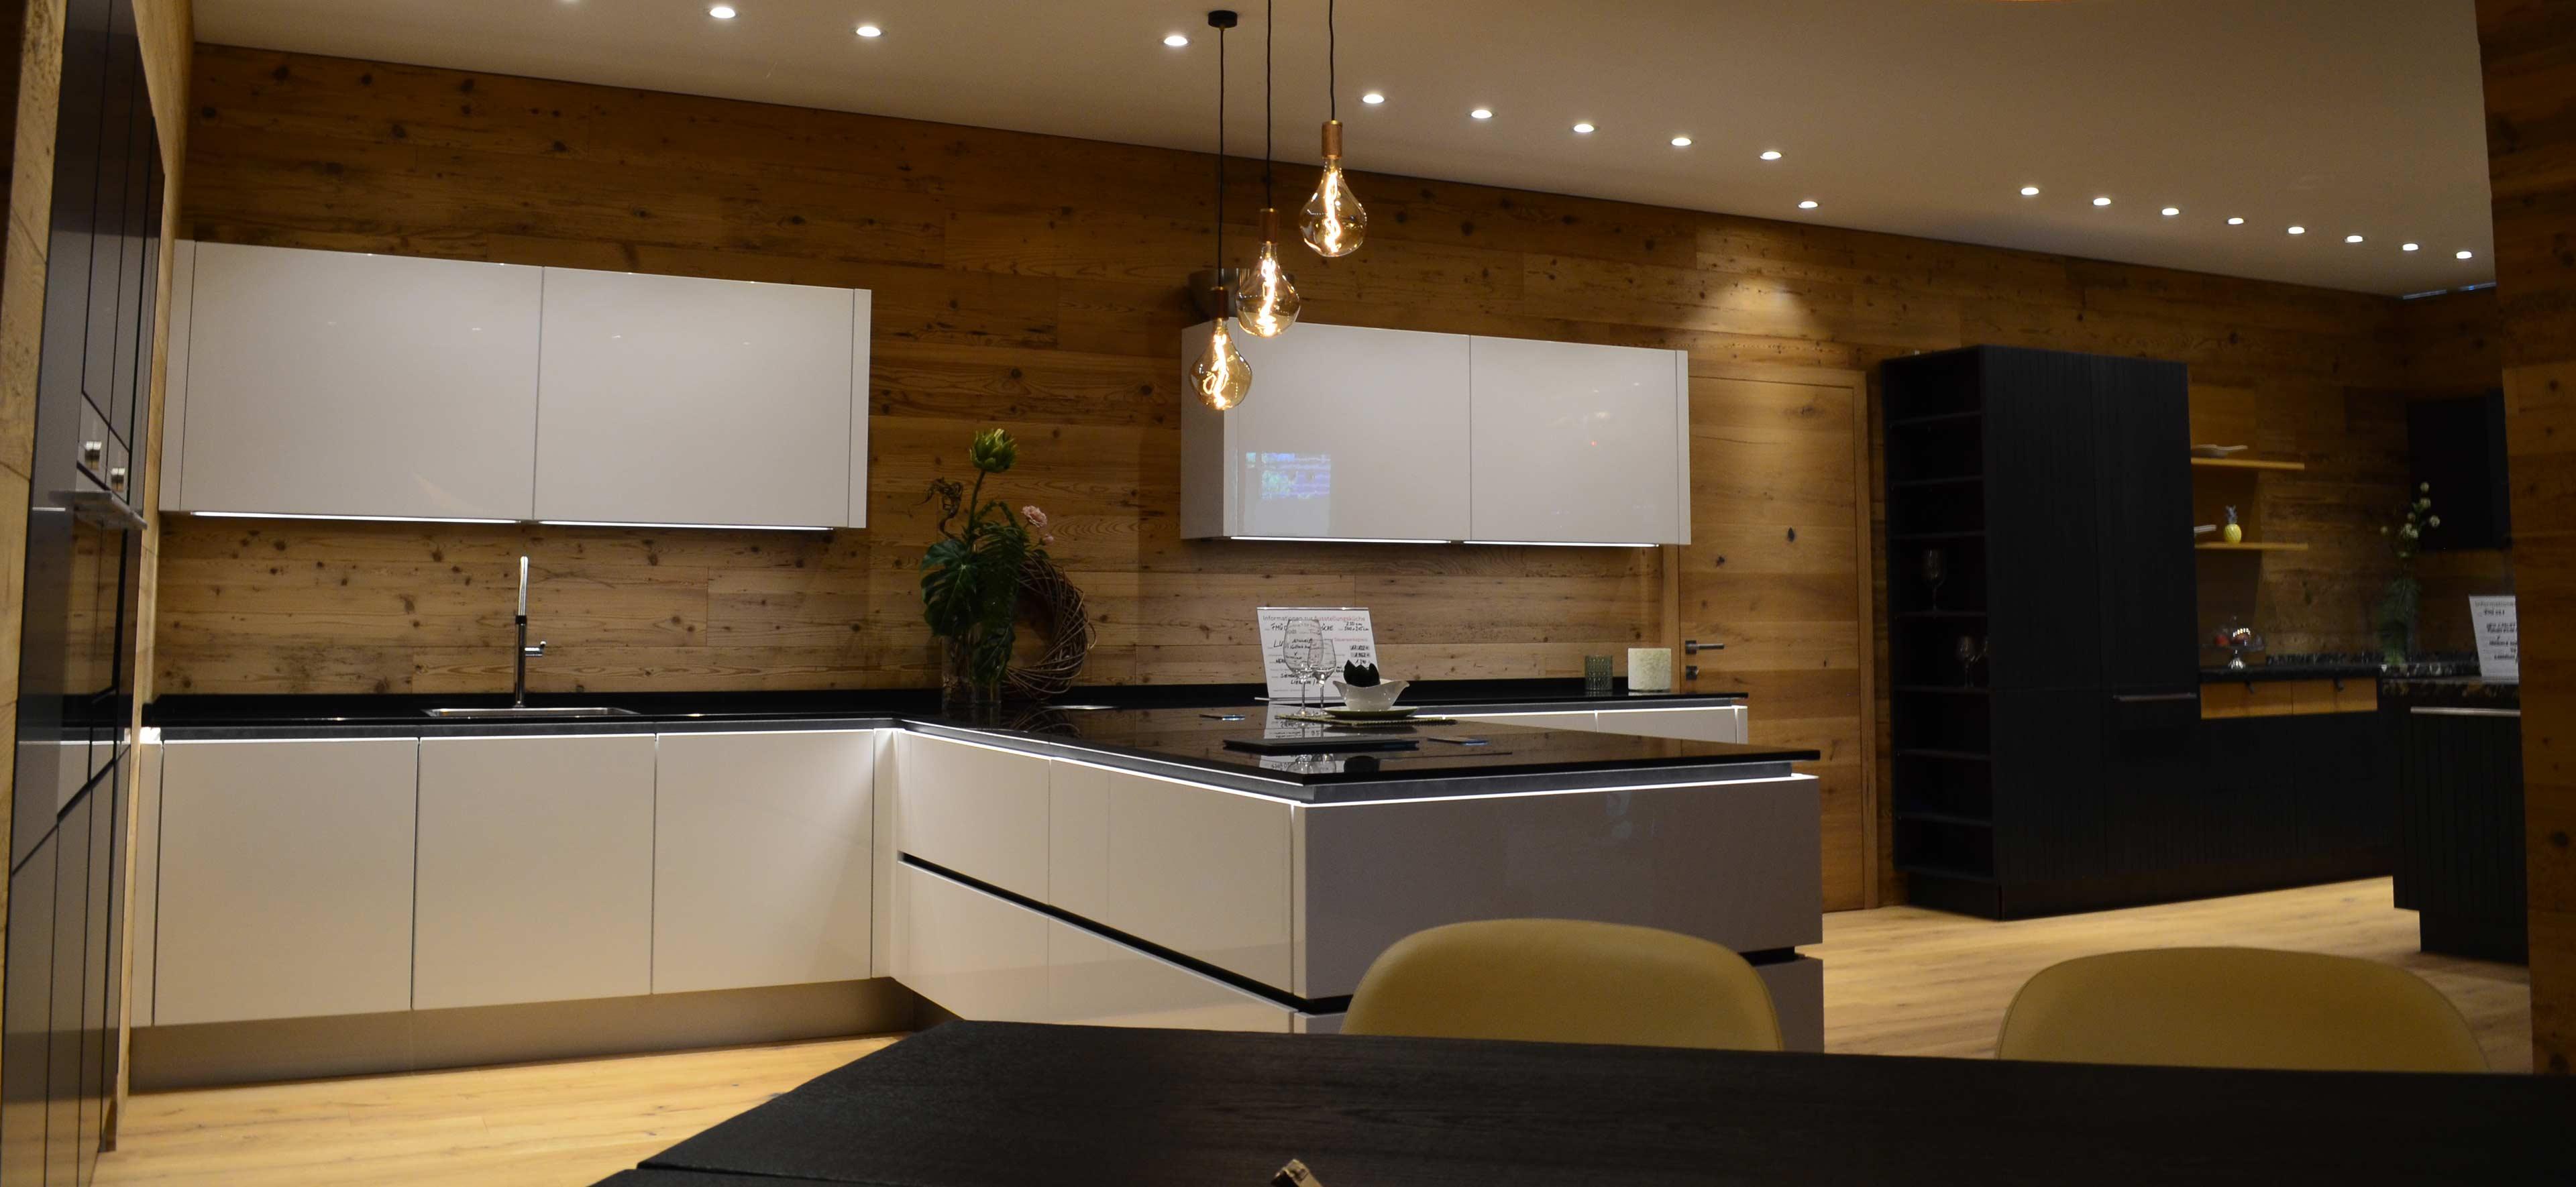 k chenstudio m nchen messe marquardt k chen. Black Bedroom Furniture Sets. Home Design Ideas